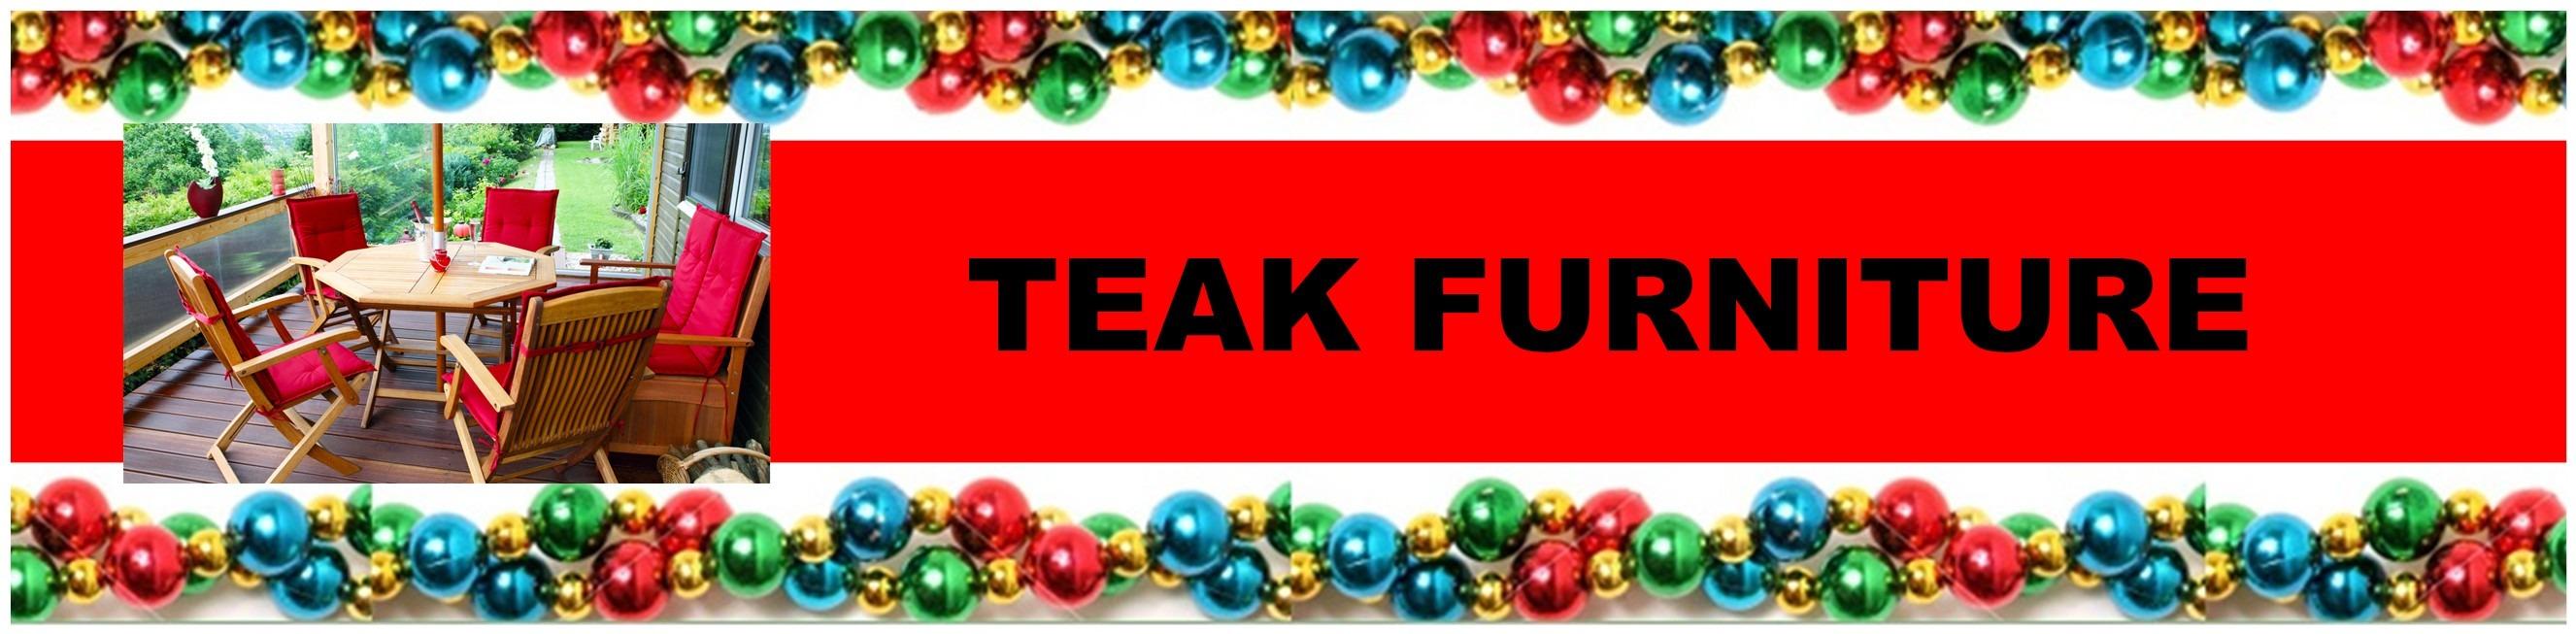 CHRISTMAS TEAK FURNITURE HEADER